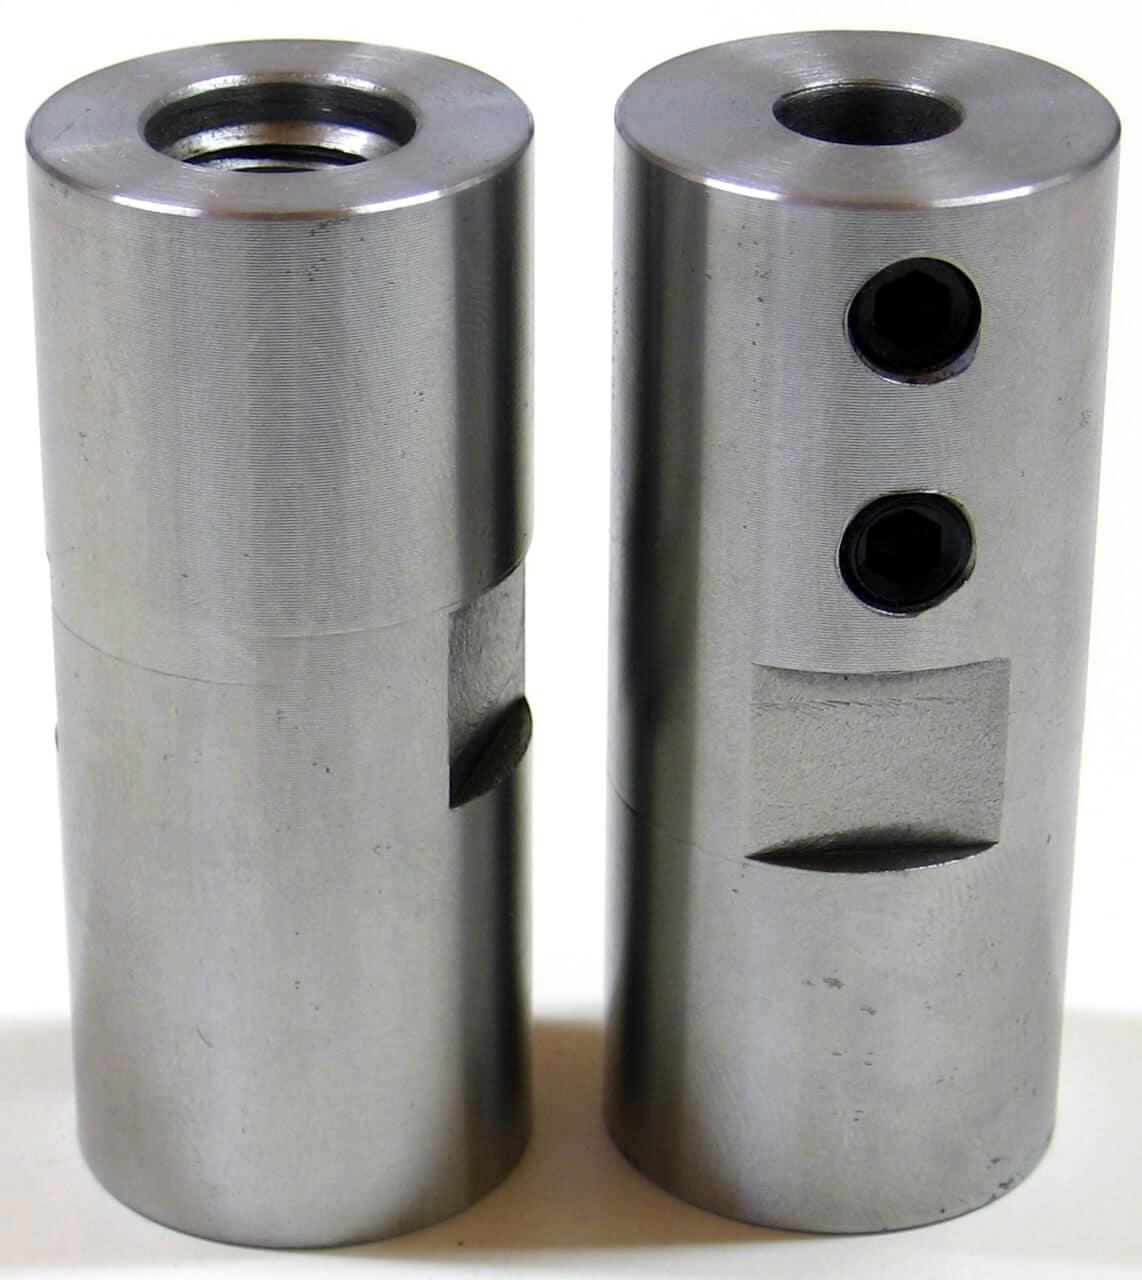 10mm - M14 Adaptor